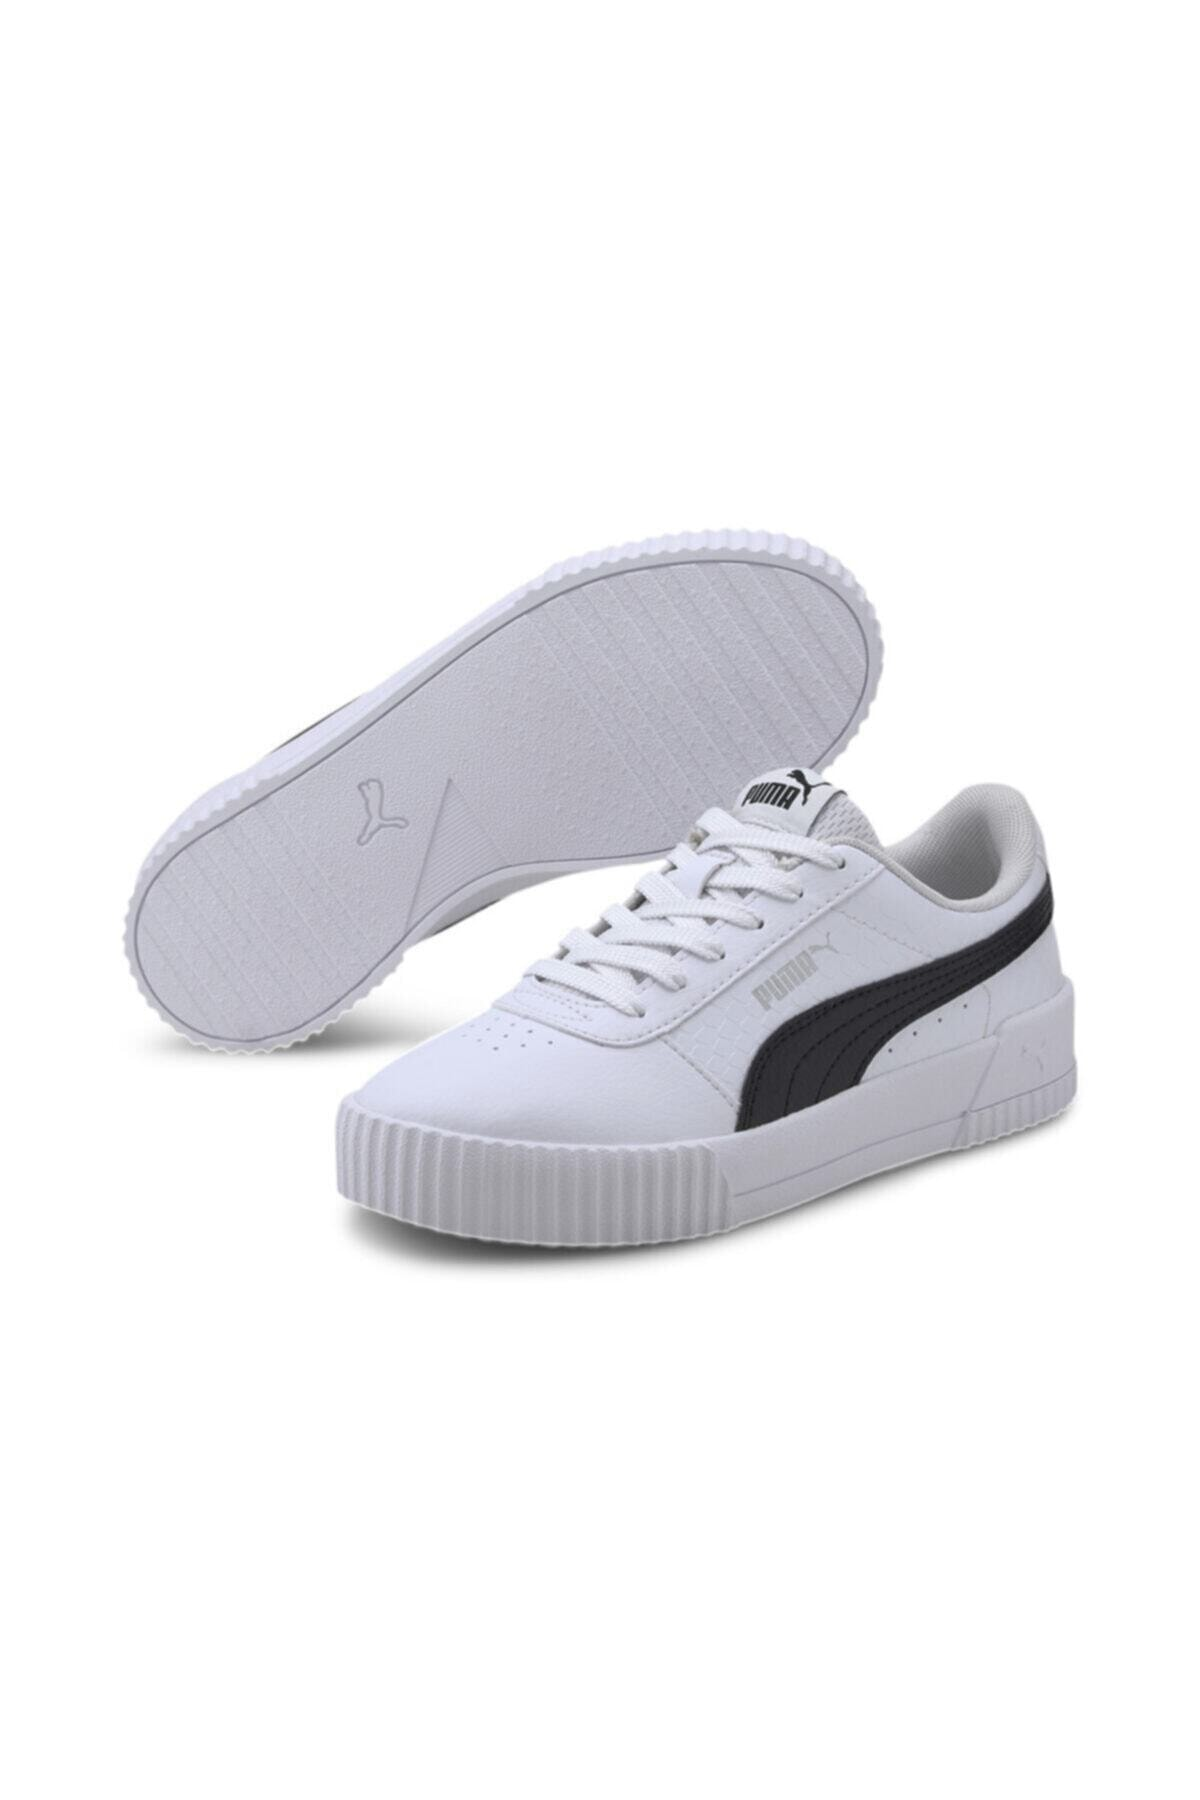 Puma Carina Snake Jr Unisex Siyah Beyaz Sneaker 2